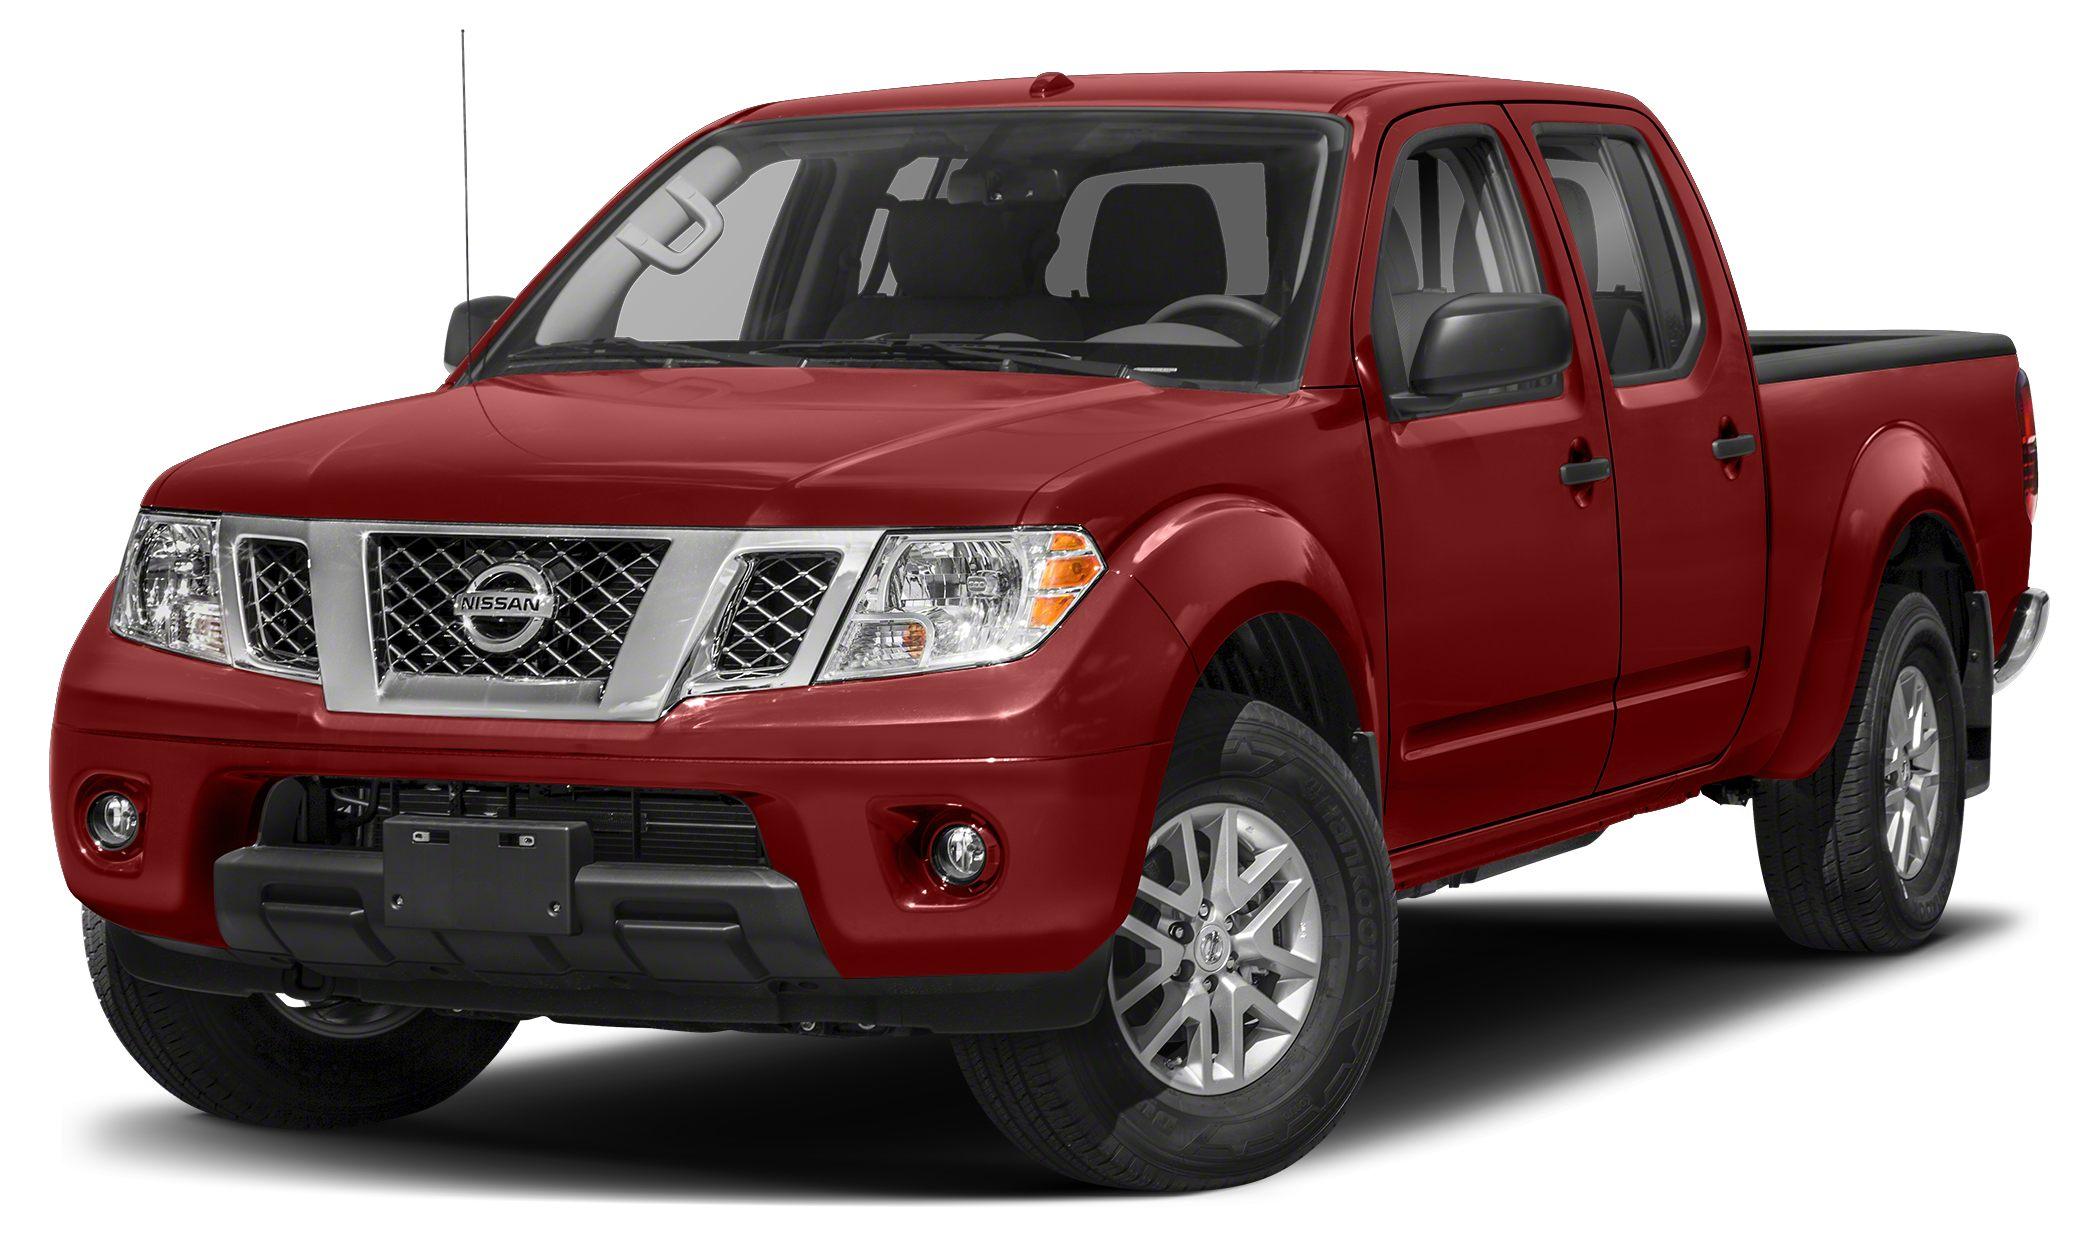 2018 Nissan Frontier SV Miles 8Color Lava Red Stock 7180395 VIN 1N6AD0ER3JN751899